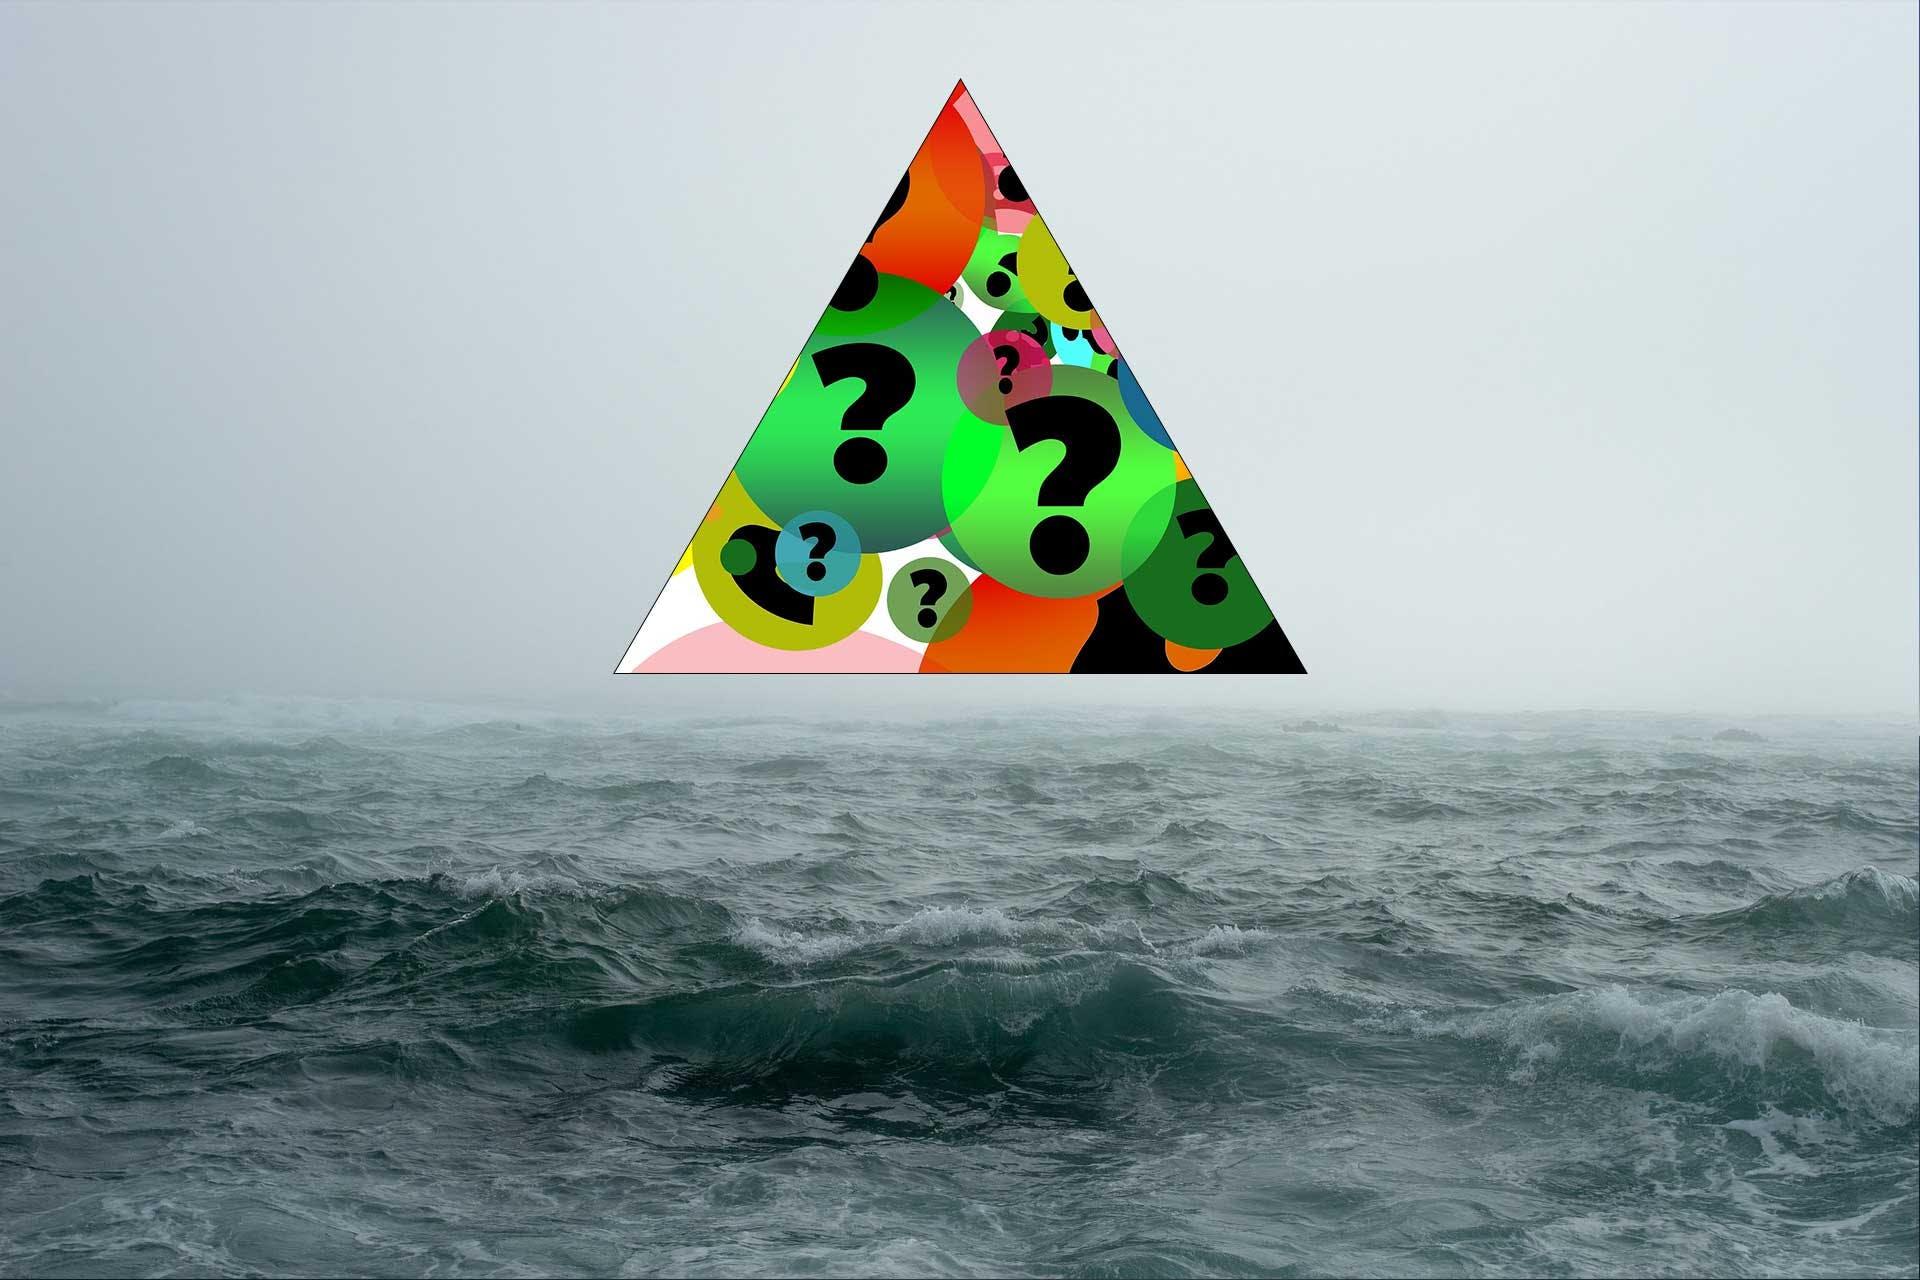 Bermuda triangle - mystery